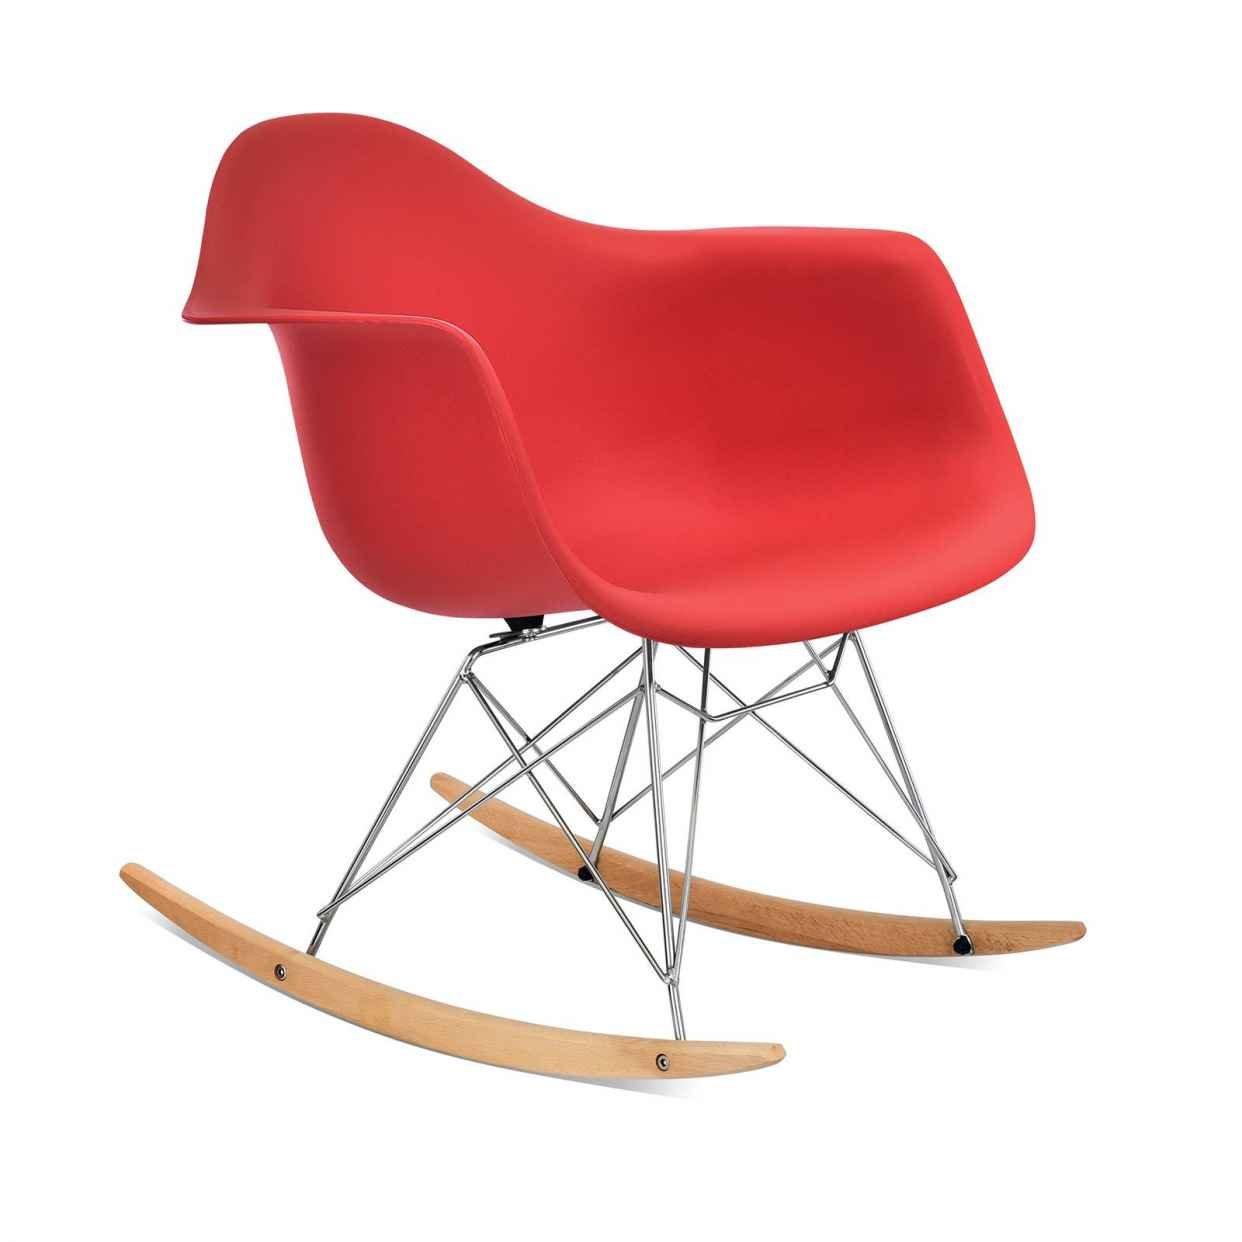 KIMCO Furniture Rocking Chair Eames Style RAR - Beech Wood Rocker - Chromed Wire Leg - Lounge Chair Arm Arms Chair Wooden Wood Wire Dowel Leg (Black) KC289D24